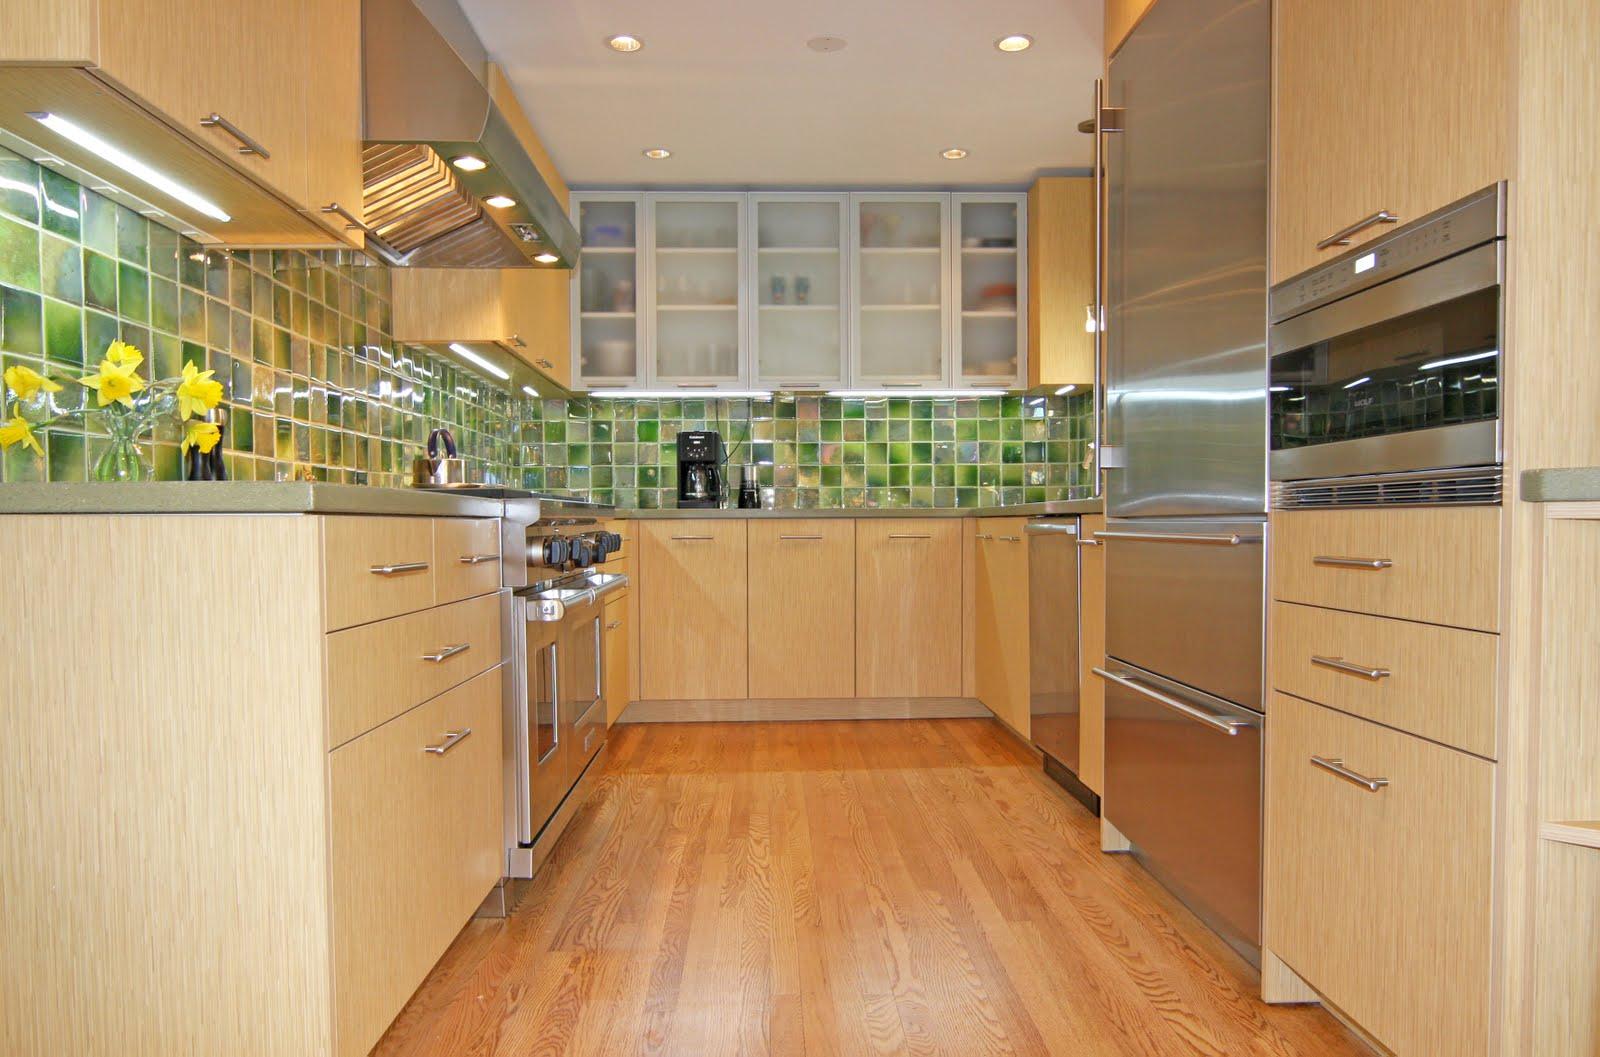 3ccchicago Green Remodel Gourmet Galley Kitchen Remodel